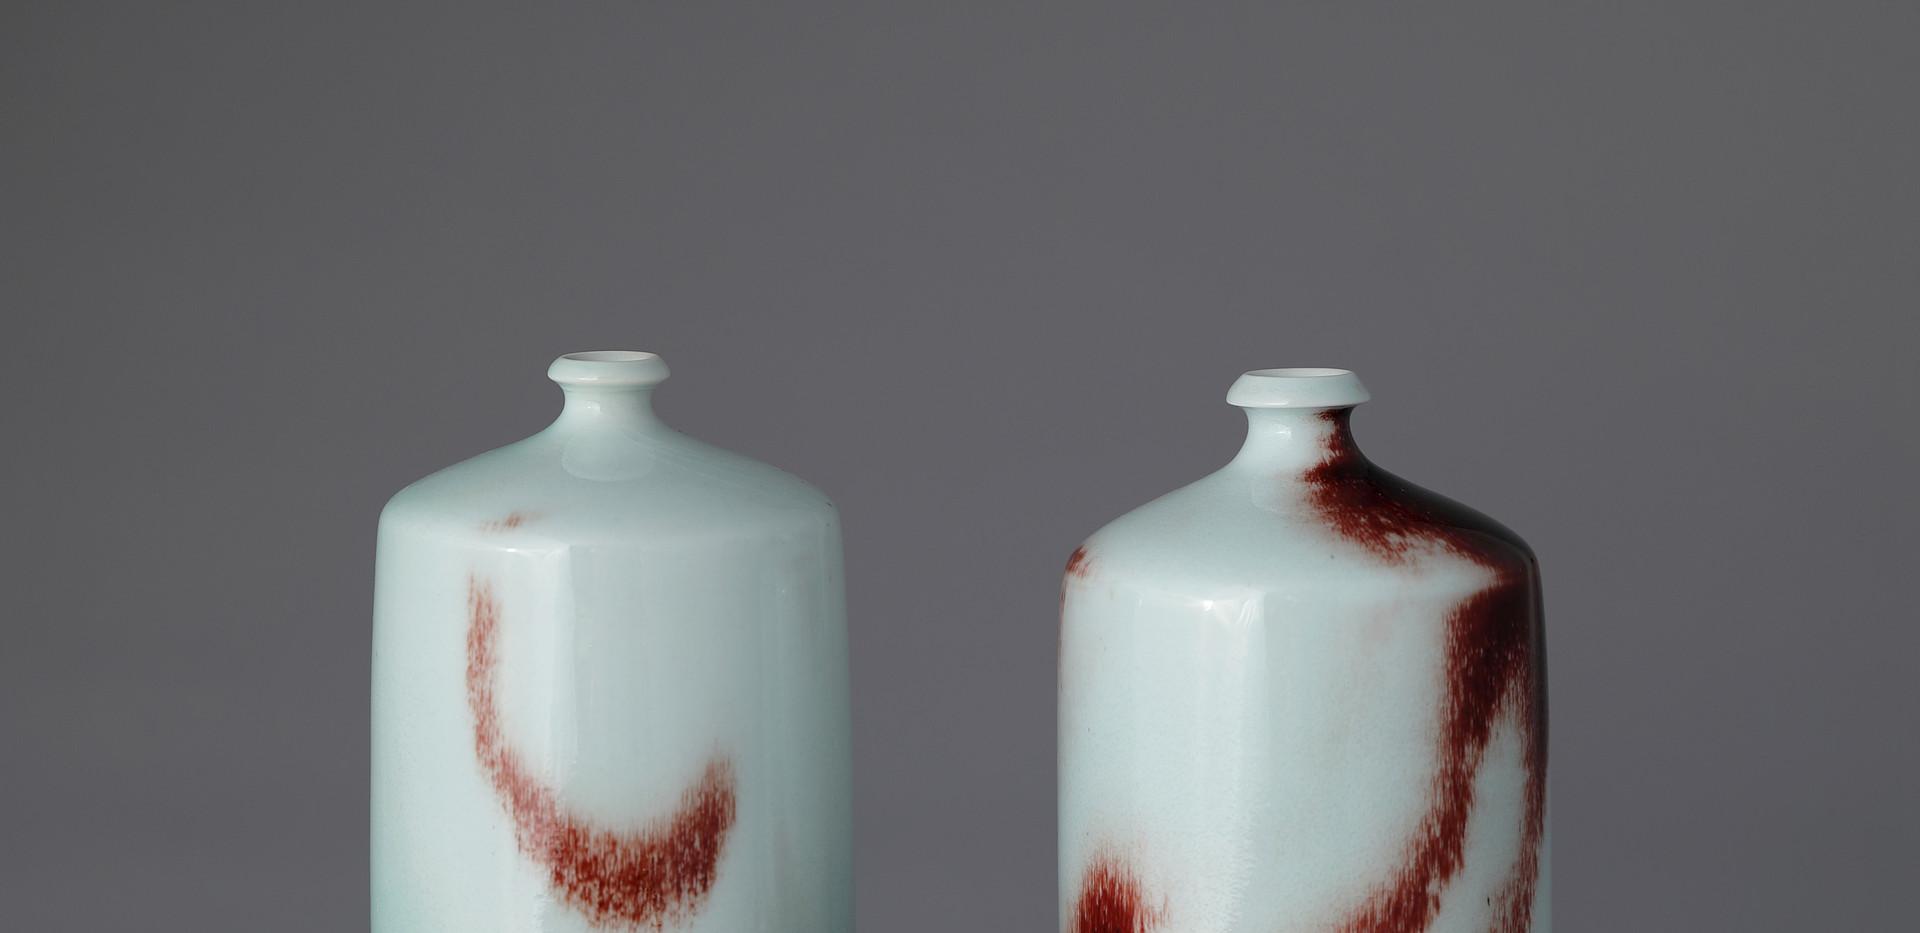 White Porcelain Elongated Bottles in Underglaze Copper-Red, 2020